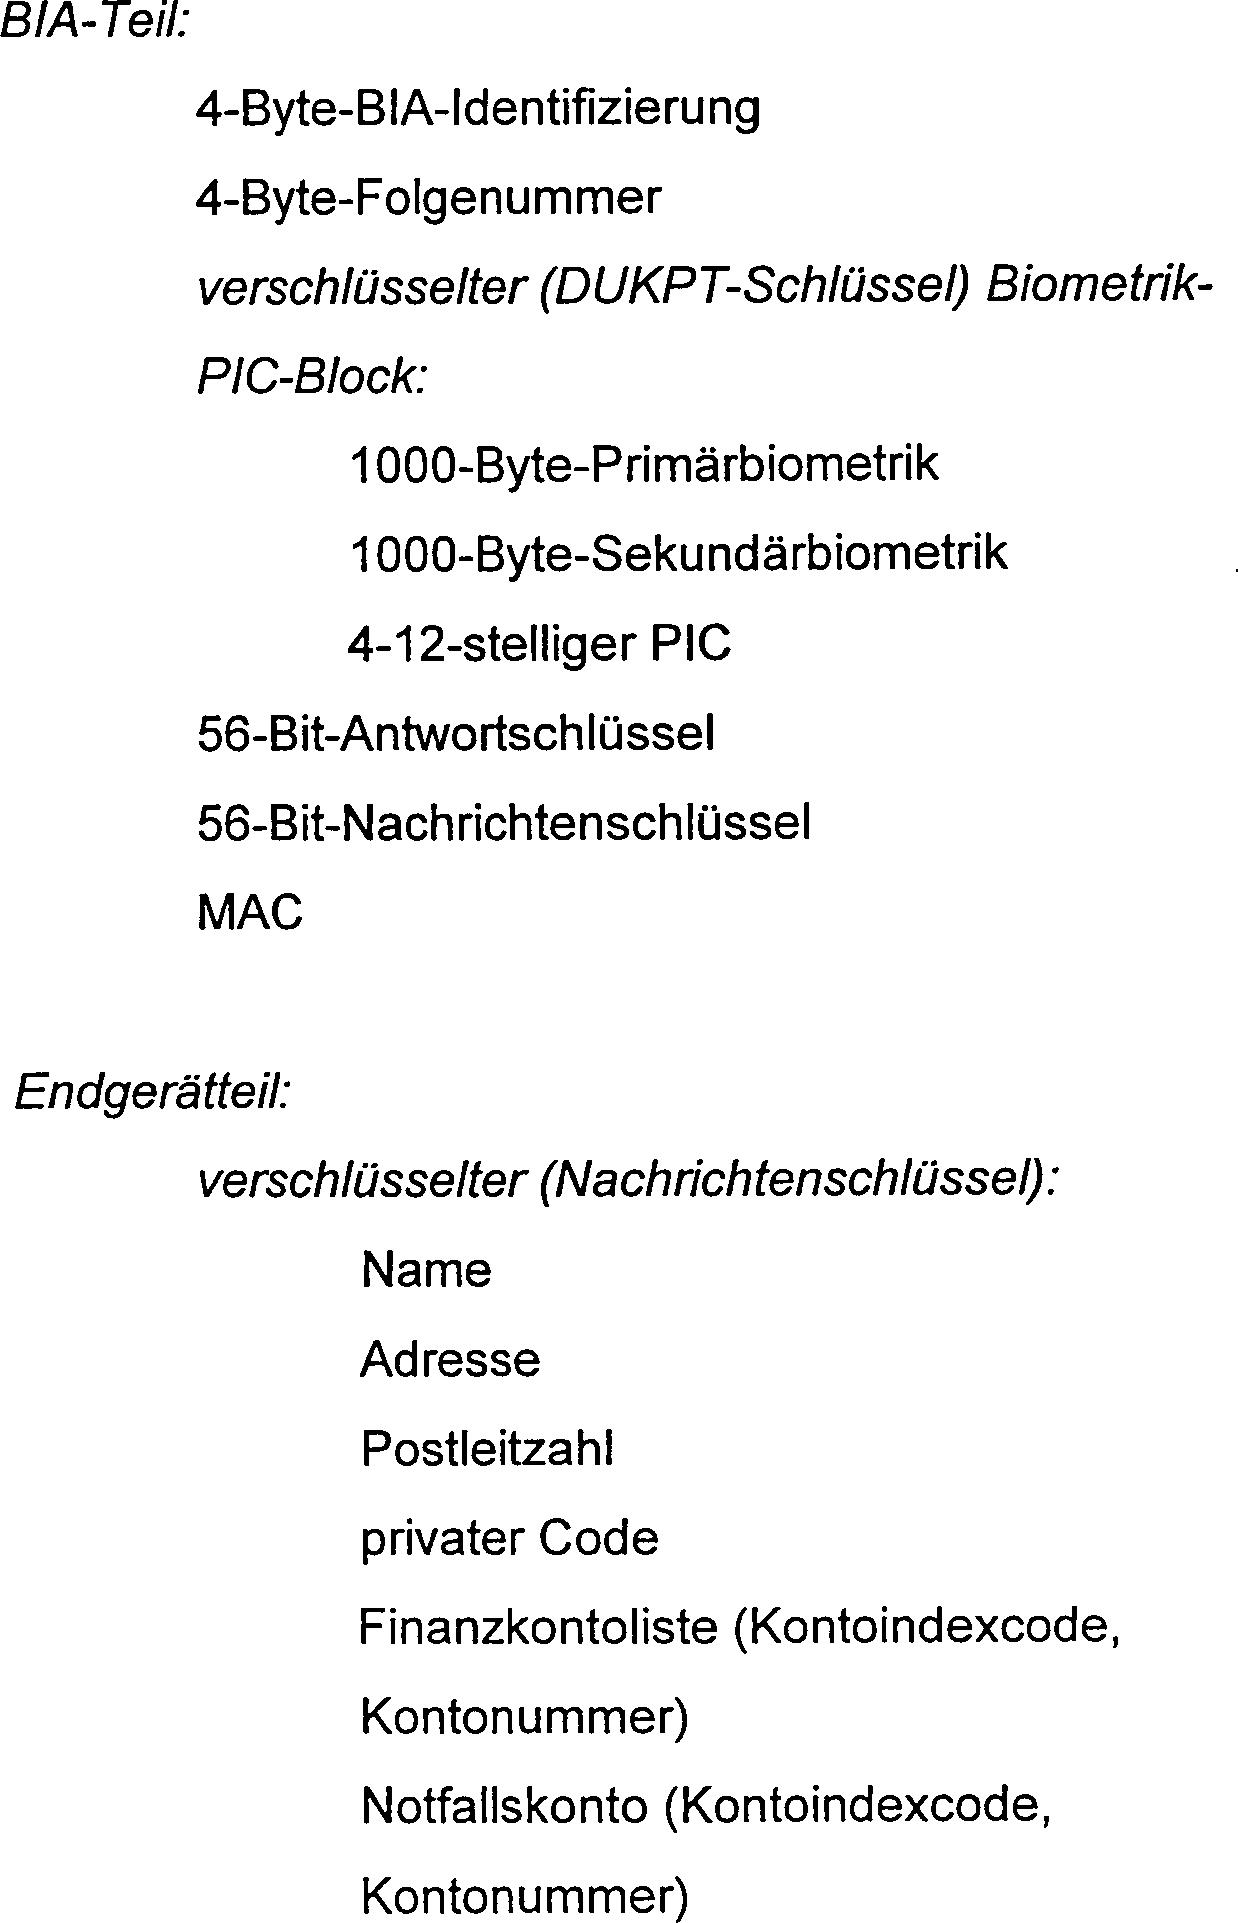 DE69630713T2 - Identification system without identity marker ...